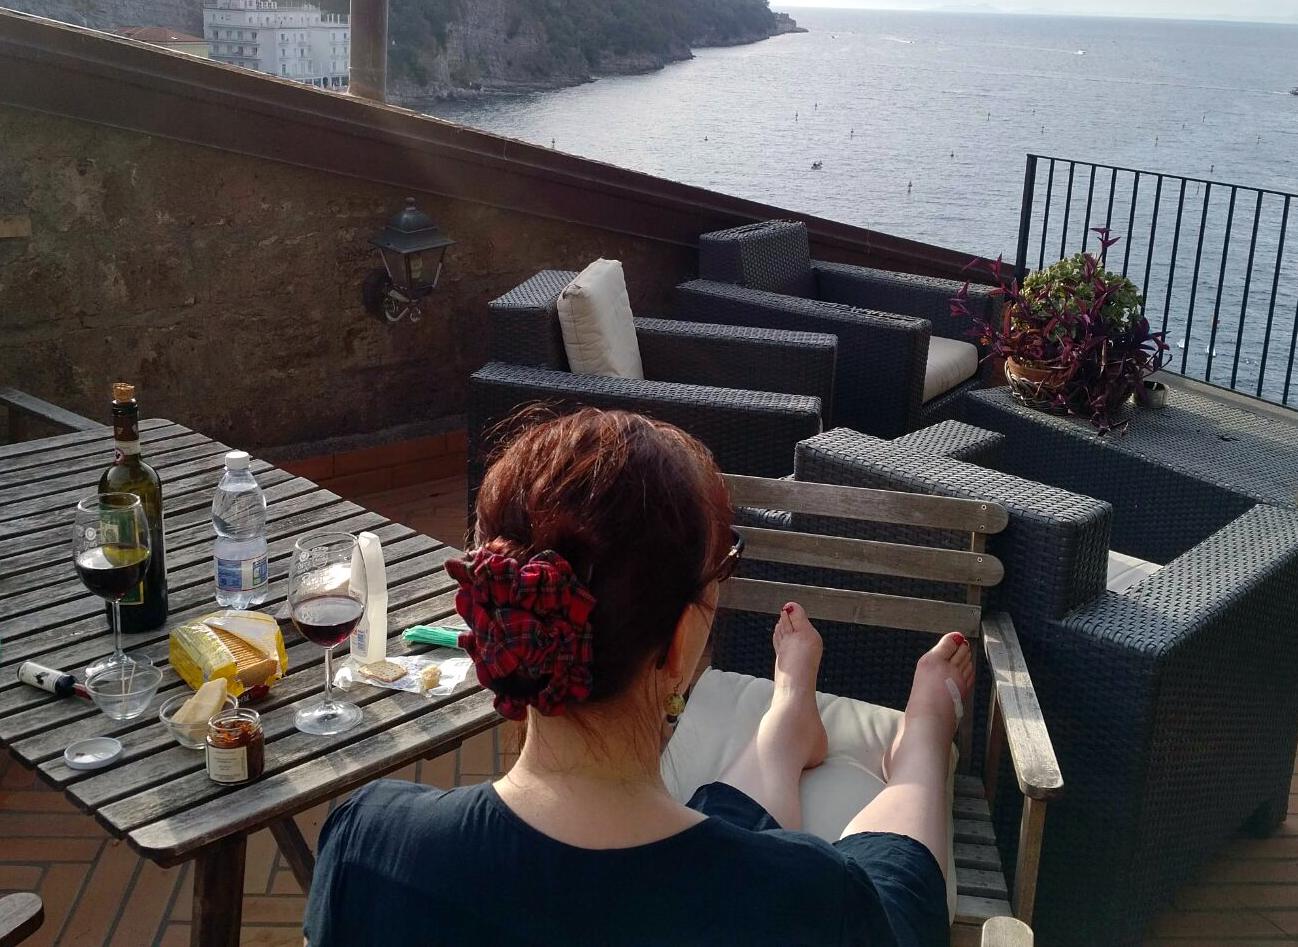 Kat on Terrace.jpg